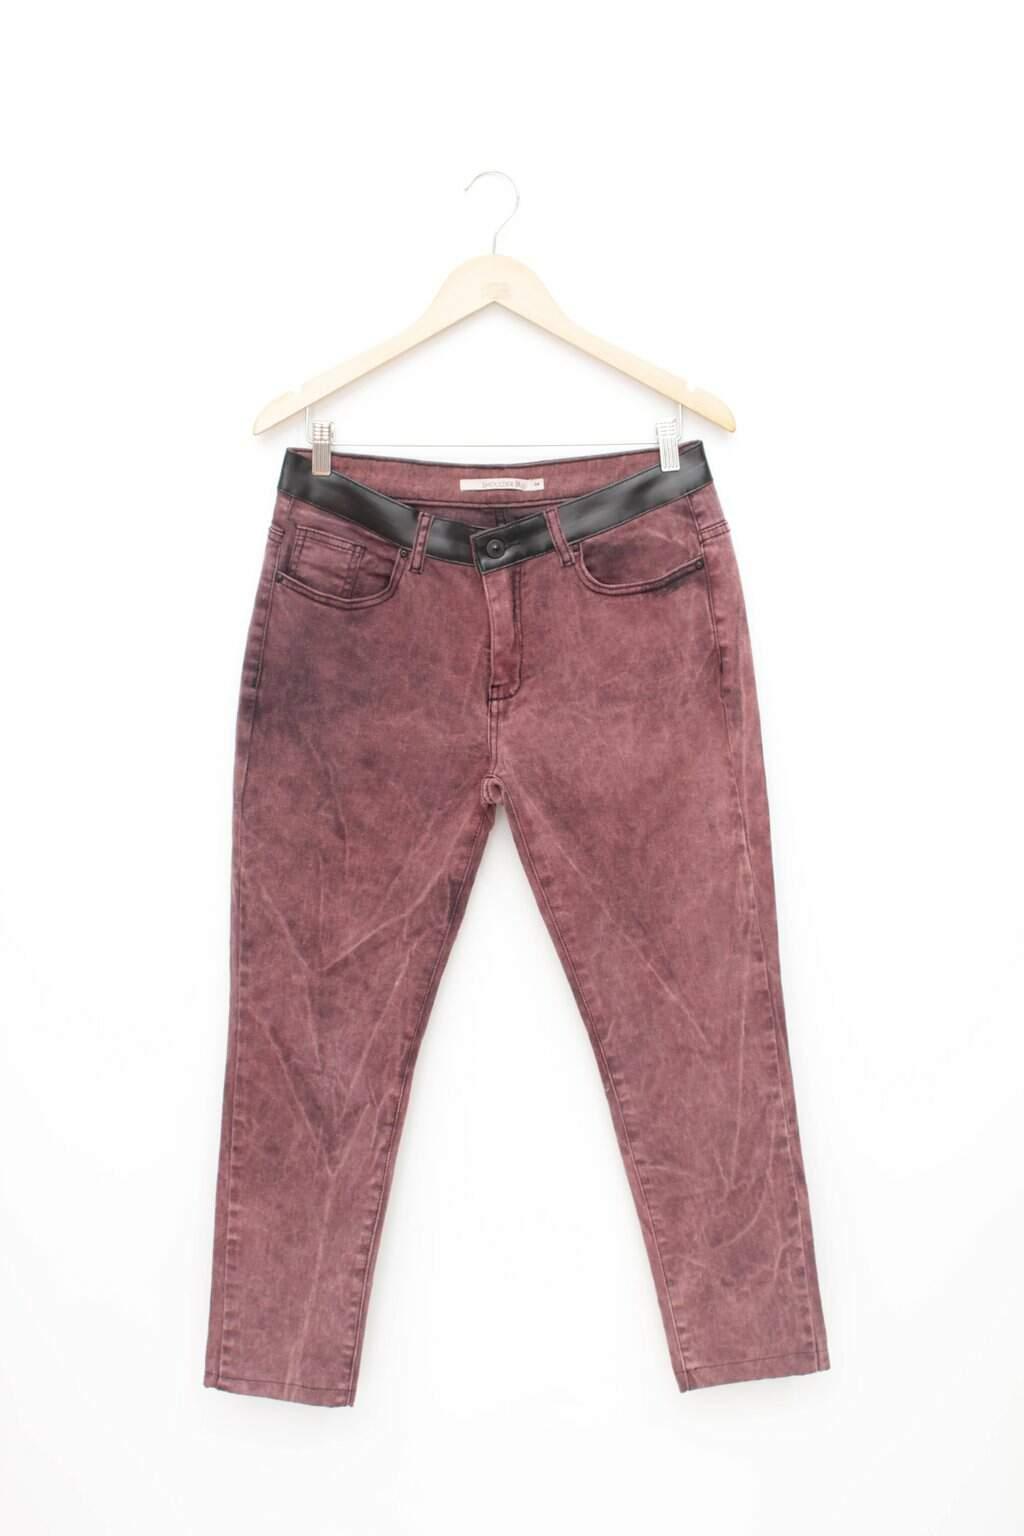 Calca Jeans Tie Dye Shoulder